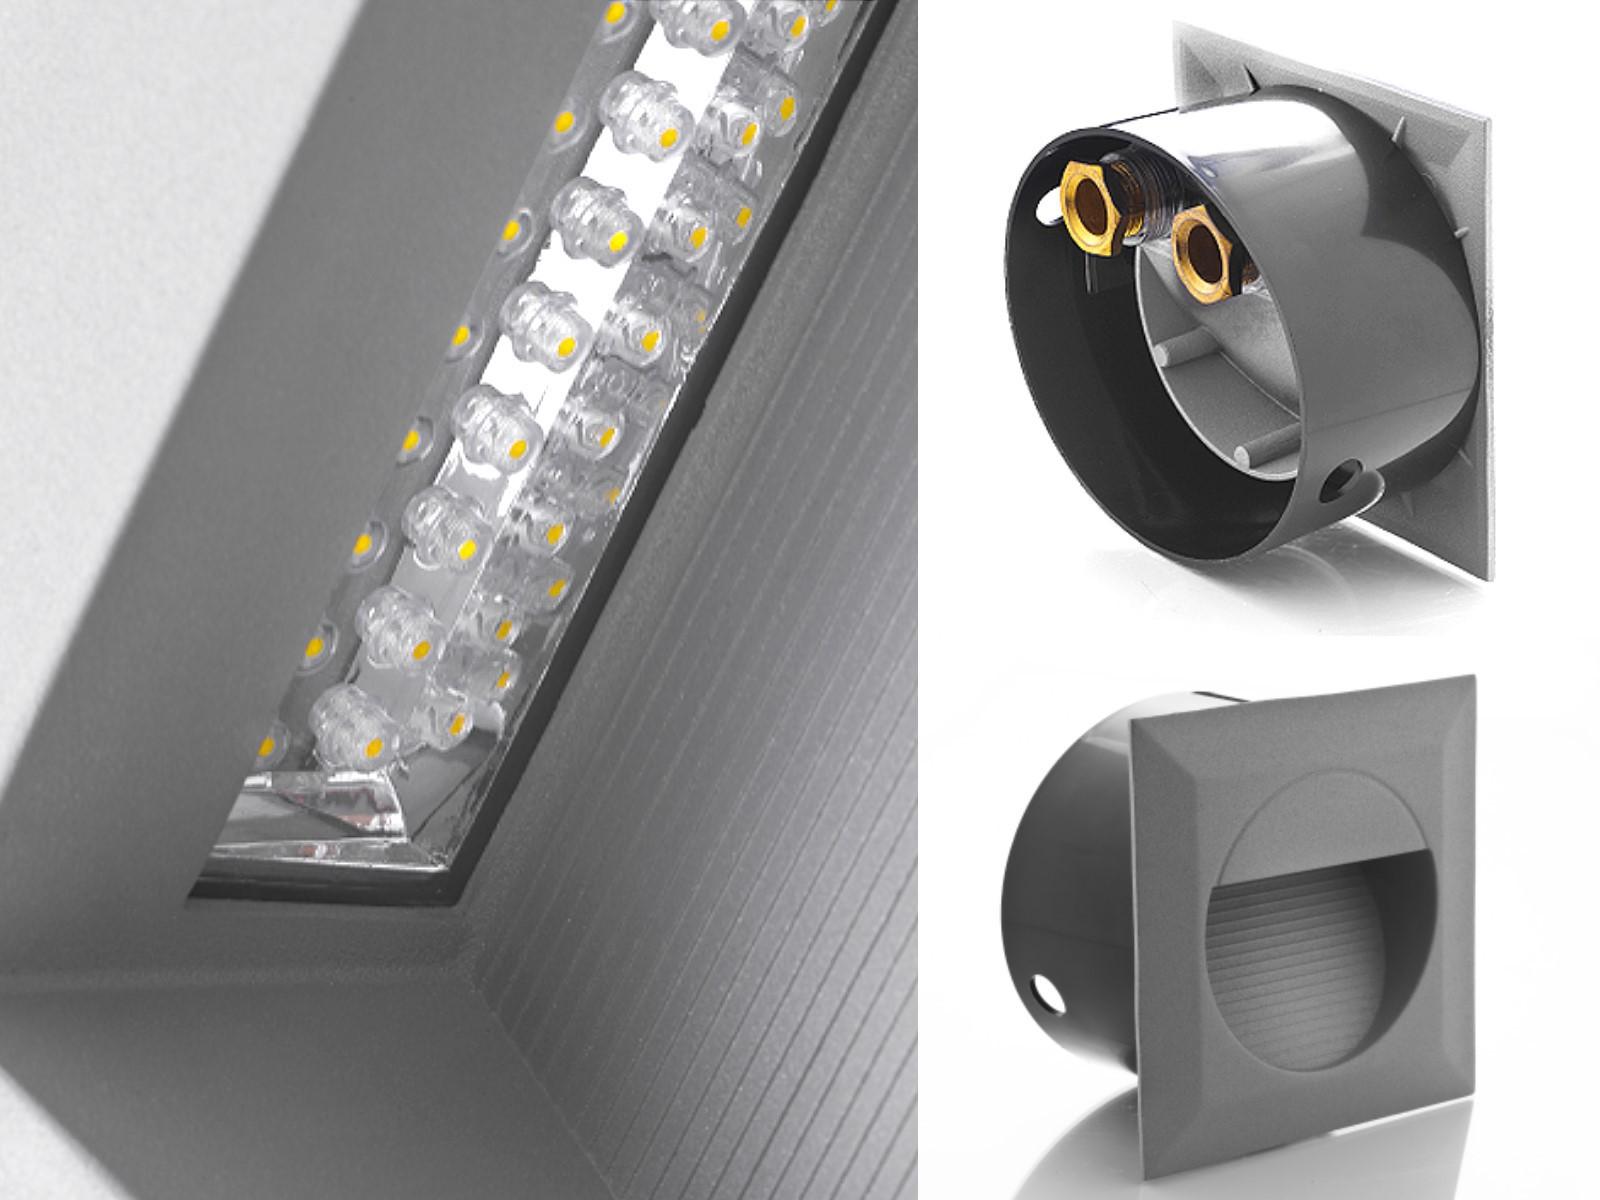 led wandeinbauleuchte treppenleuchte mini j02 1 2w 230v ip65 lichtfarbe warmwei. Black Bedroom Furniture Sets. Home Design Ideas